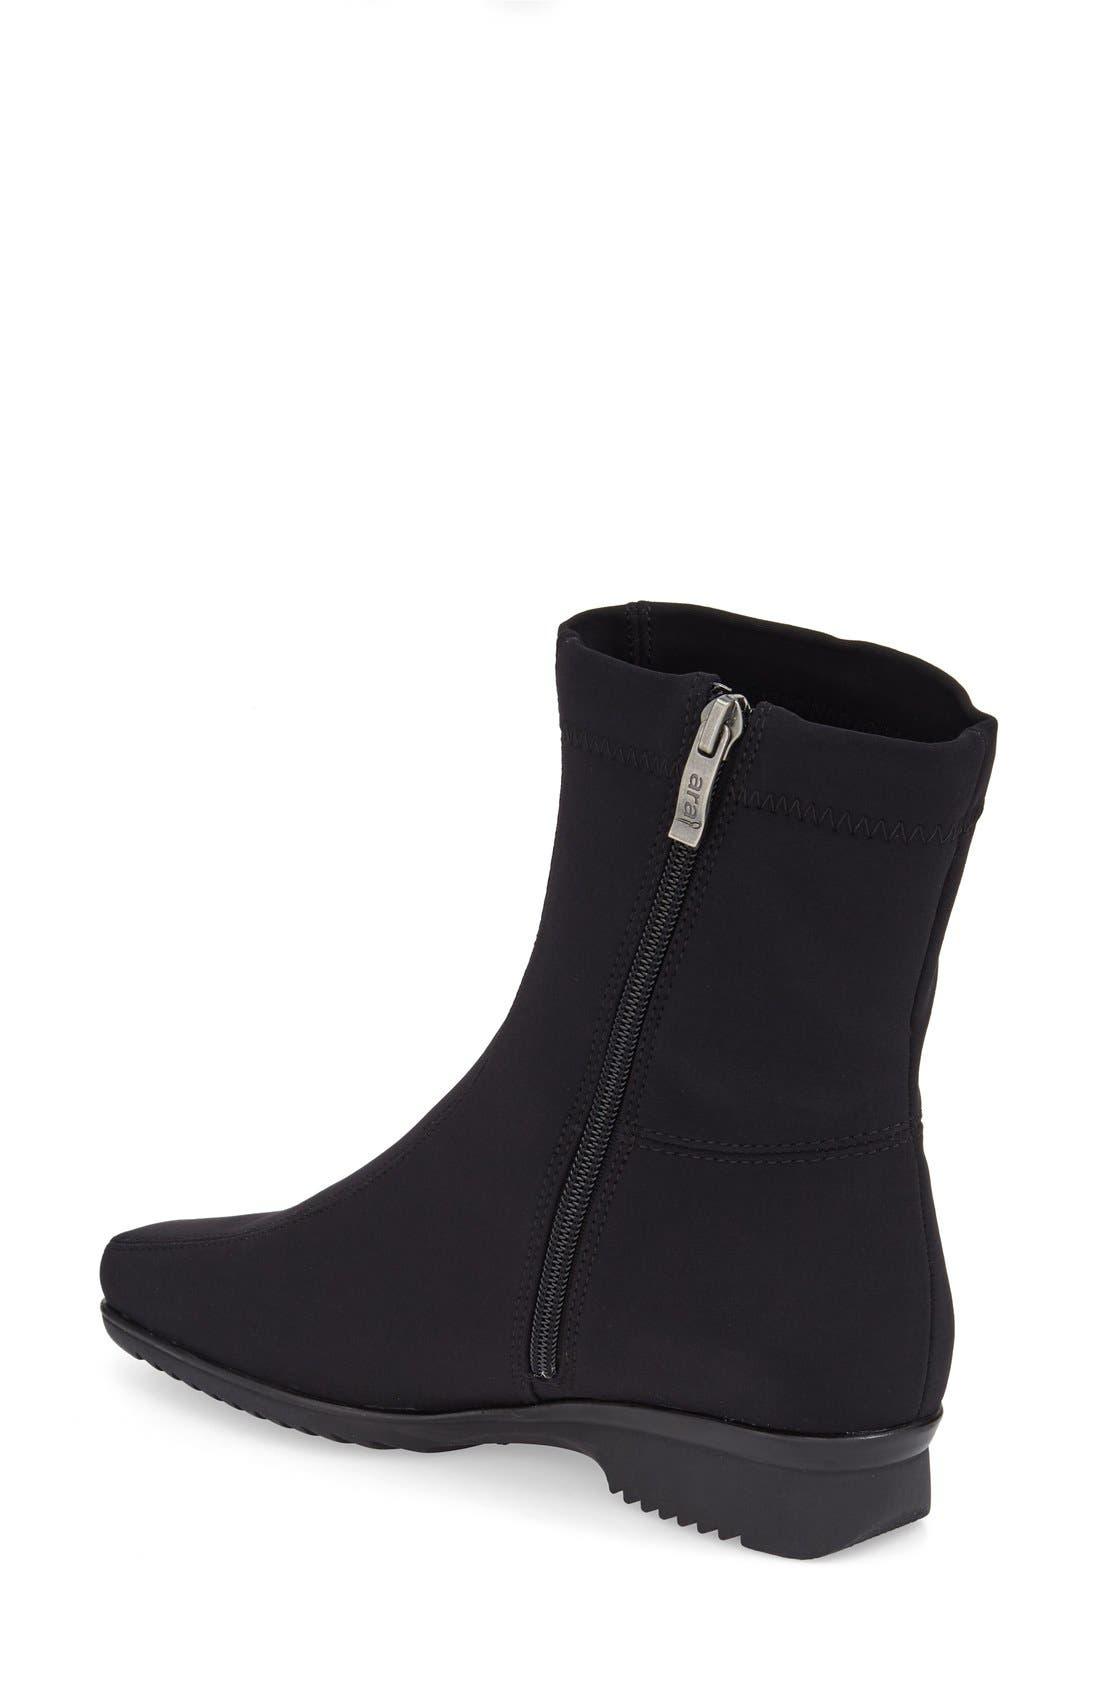 634367aeb7fb Women s Ara Shoes